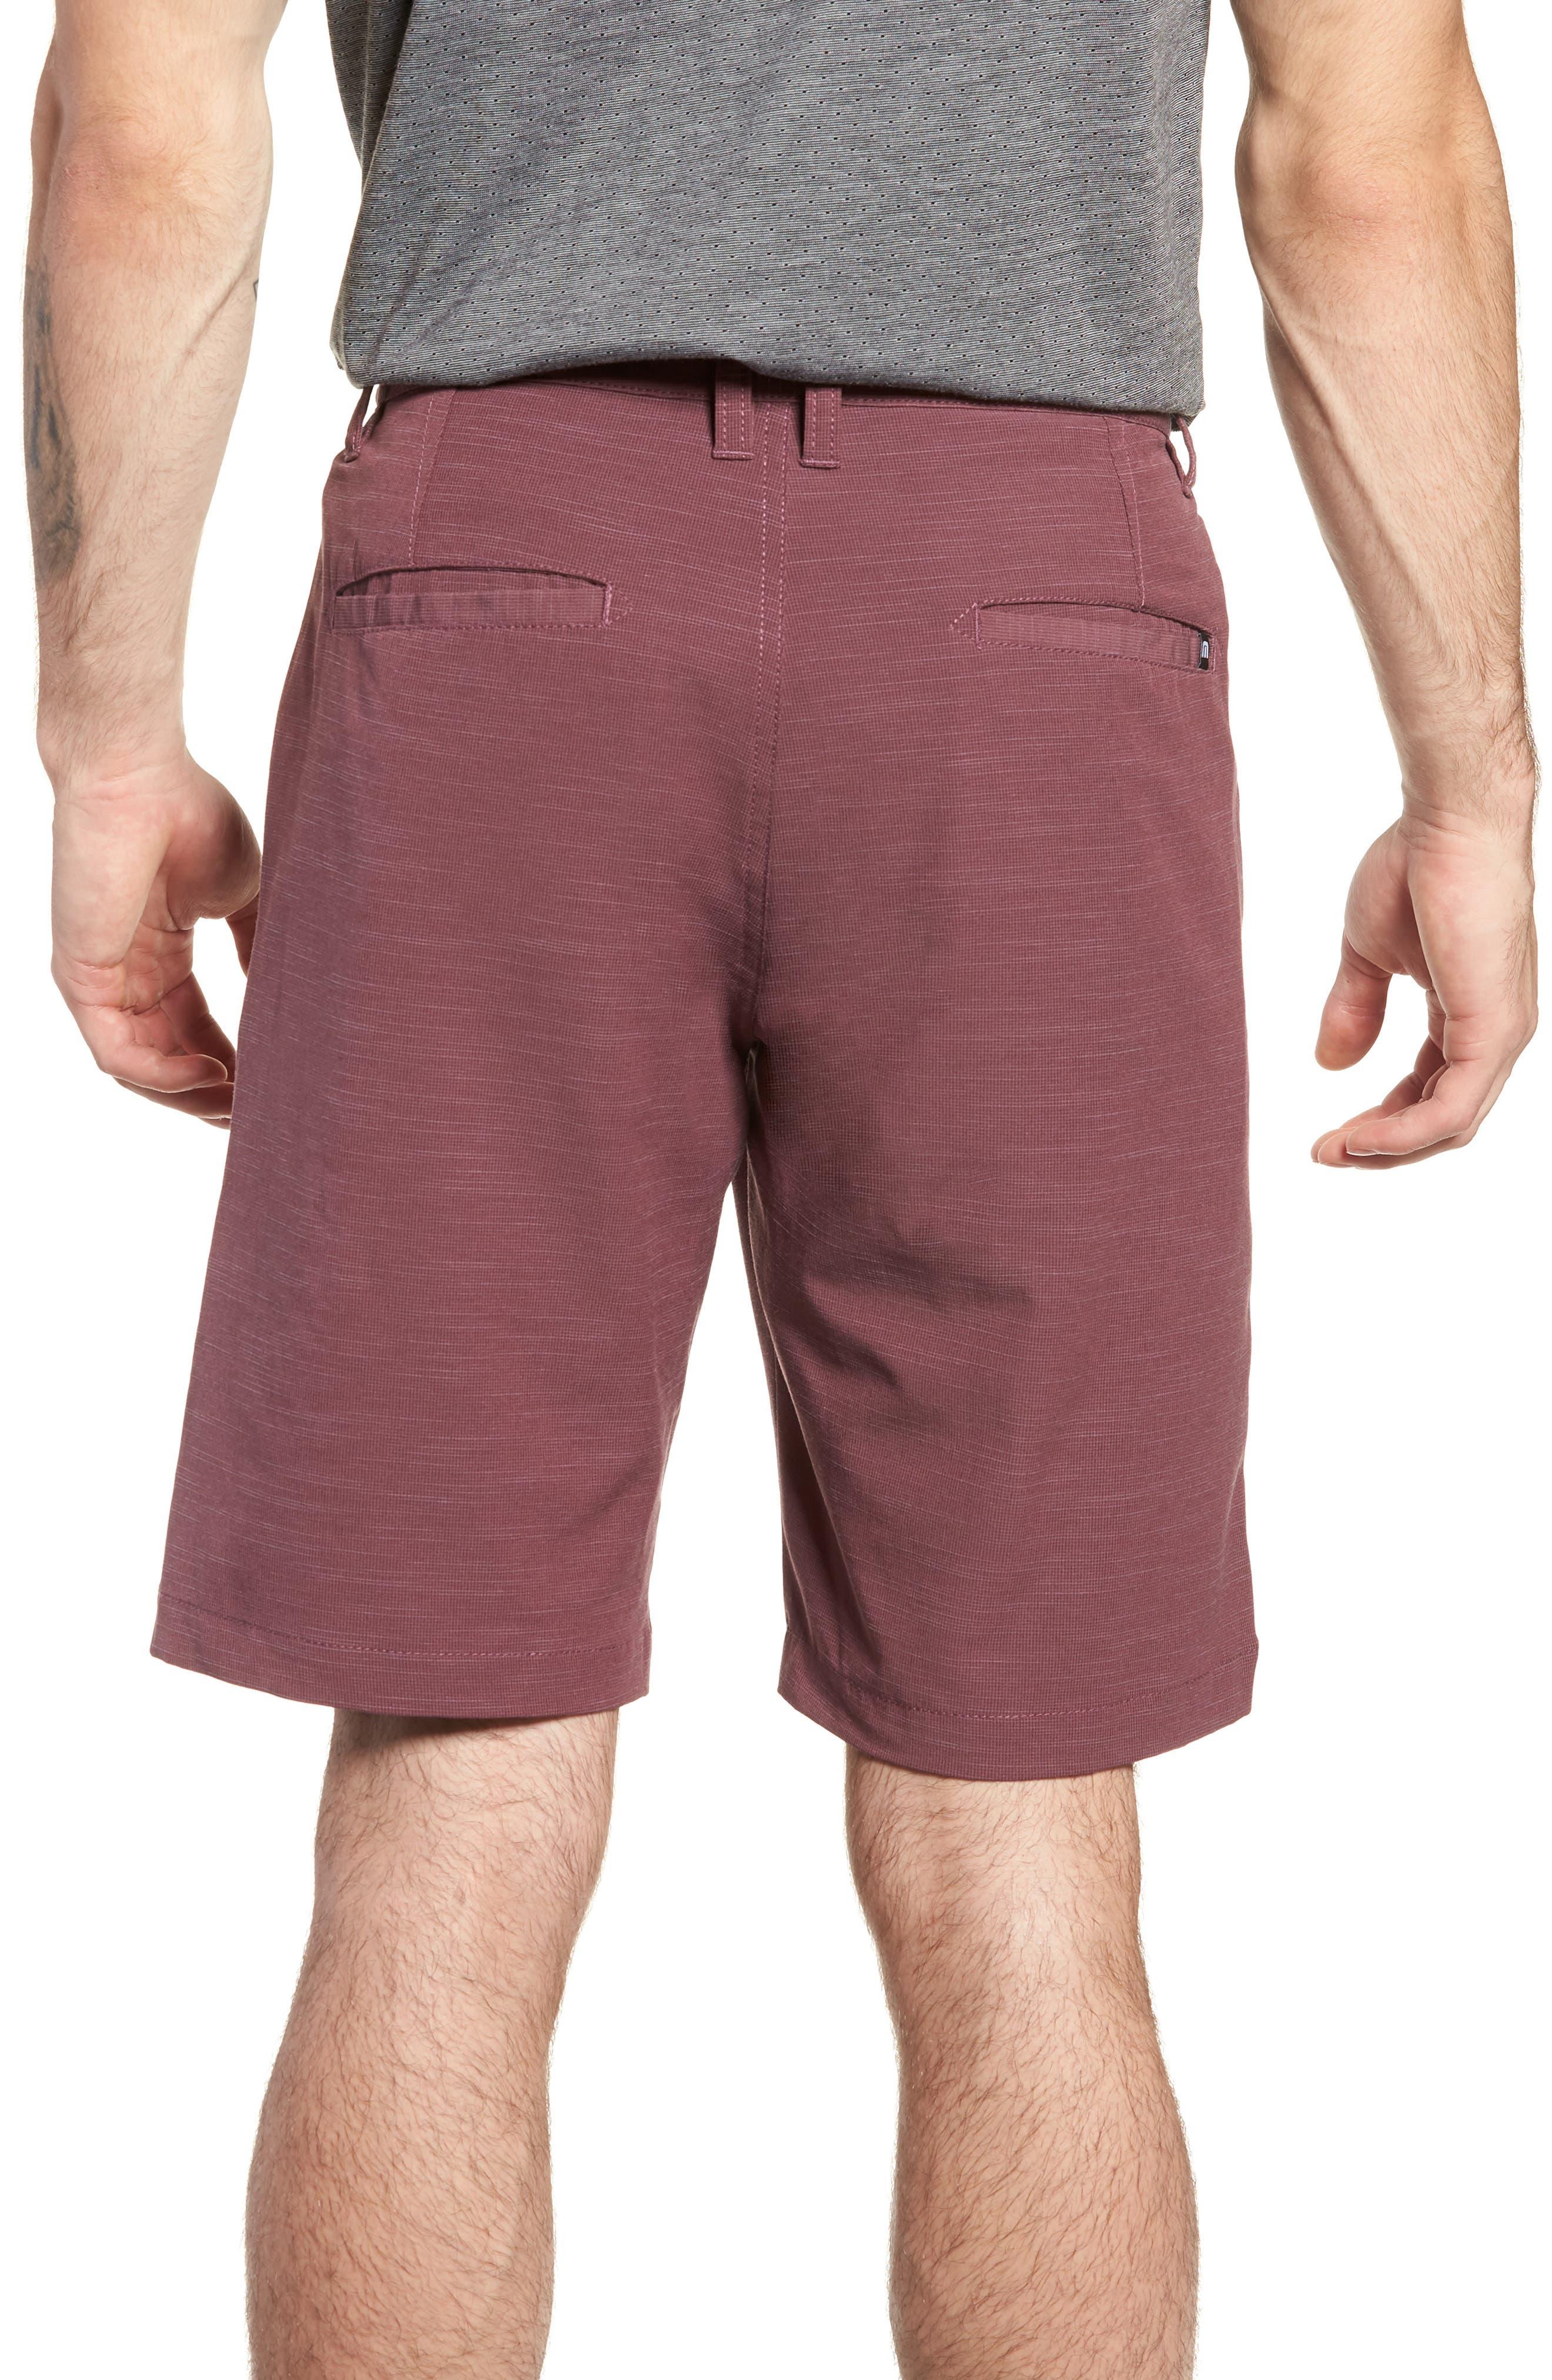 Tuner Shorts,                             Alternate thumbnail 2, color,                             EGGPLANT